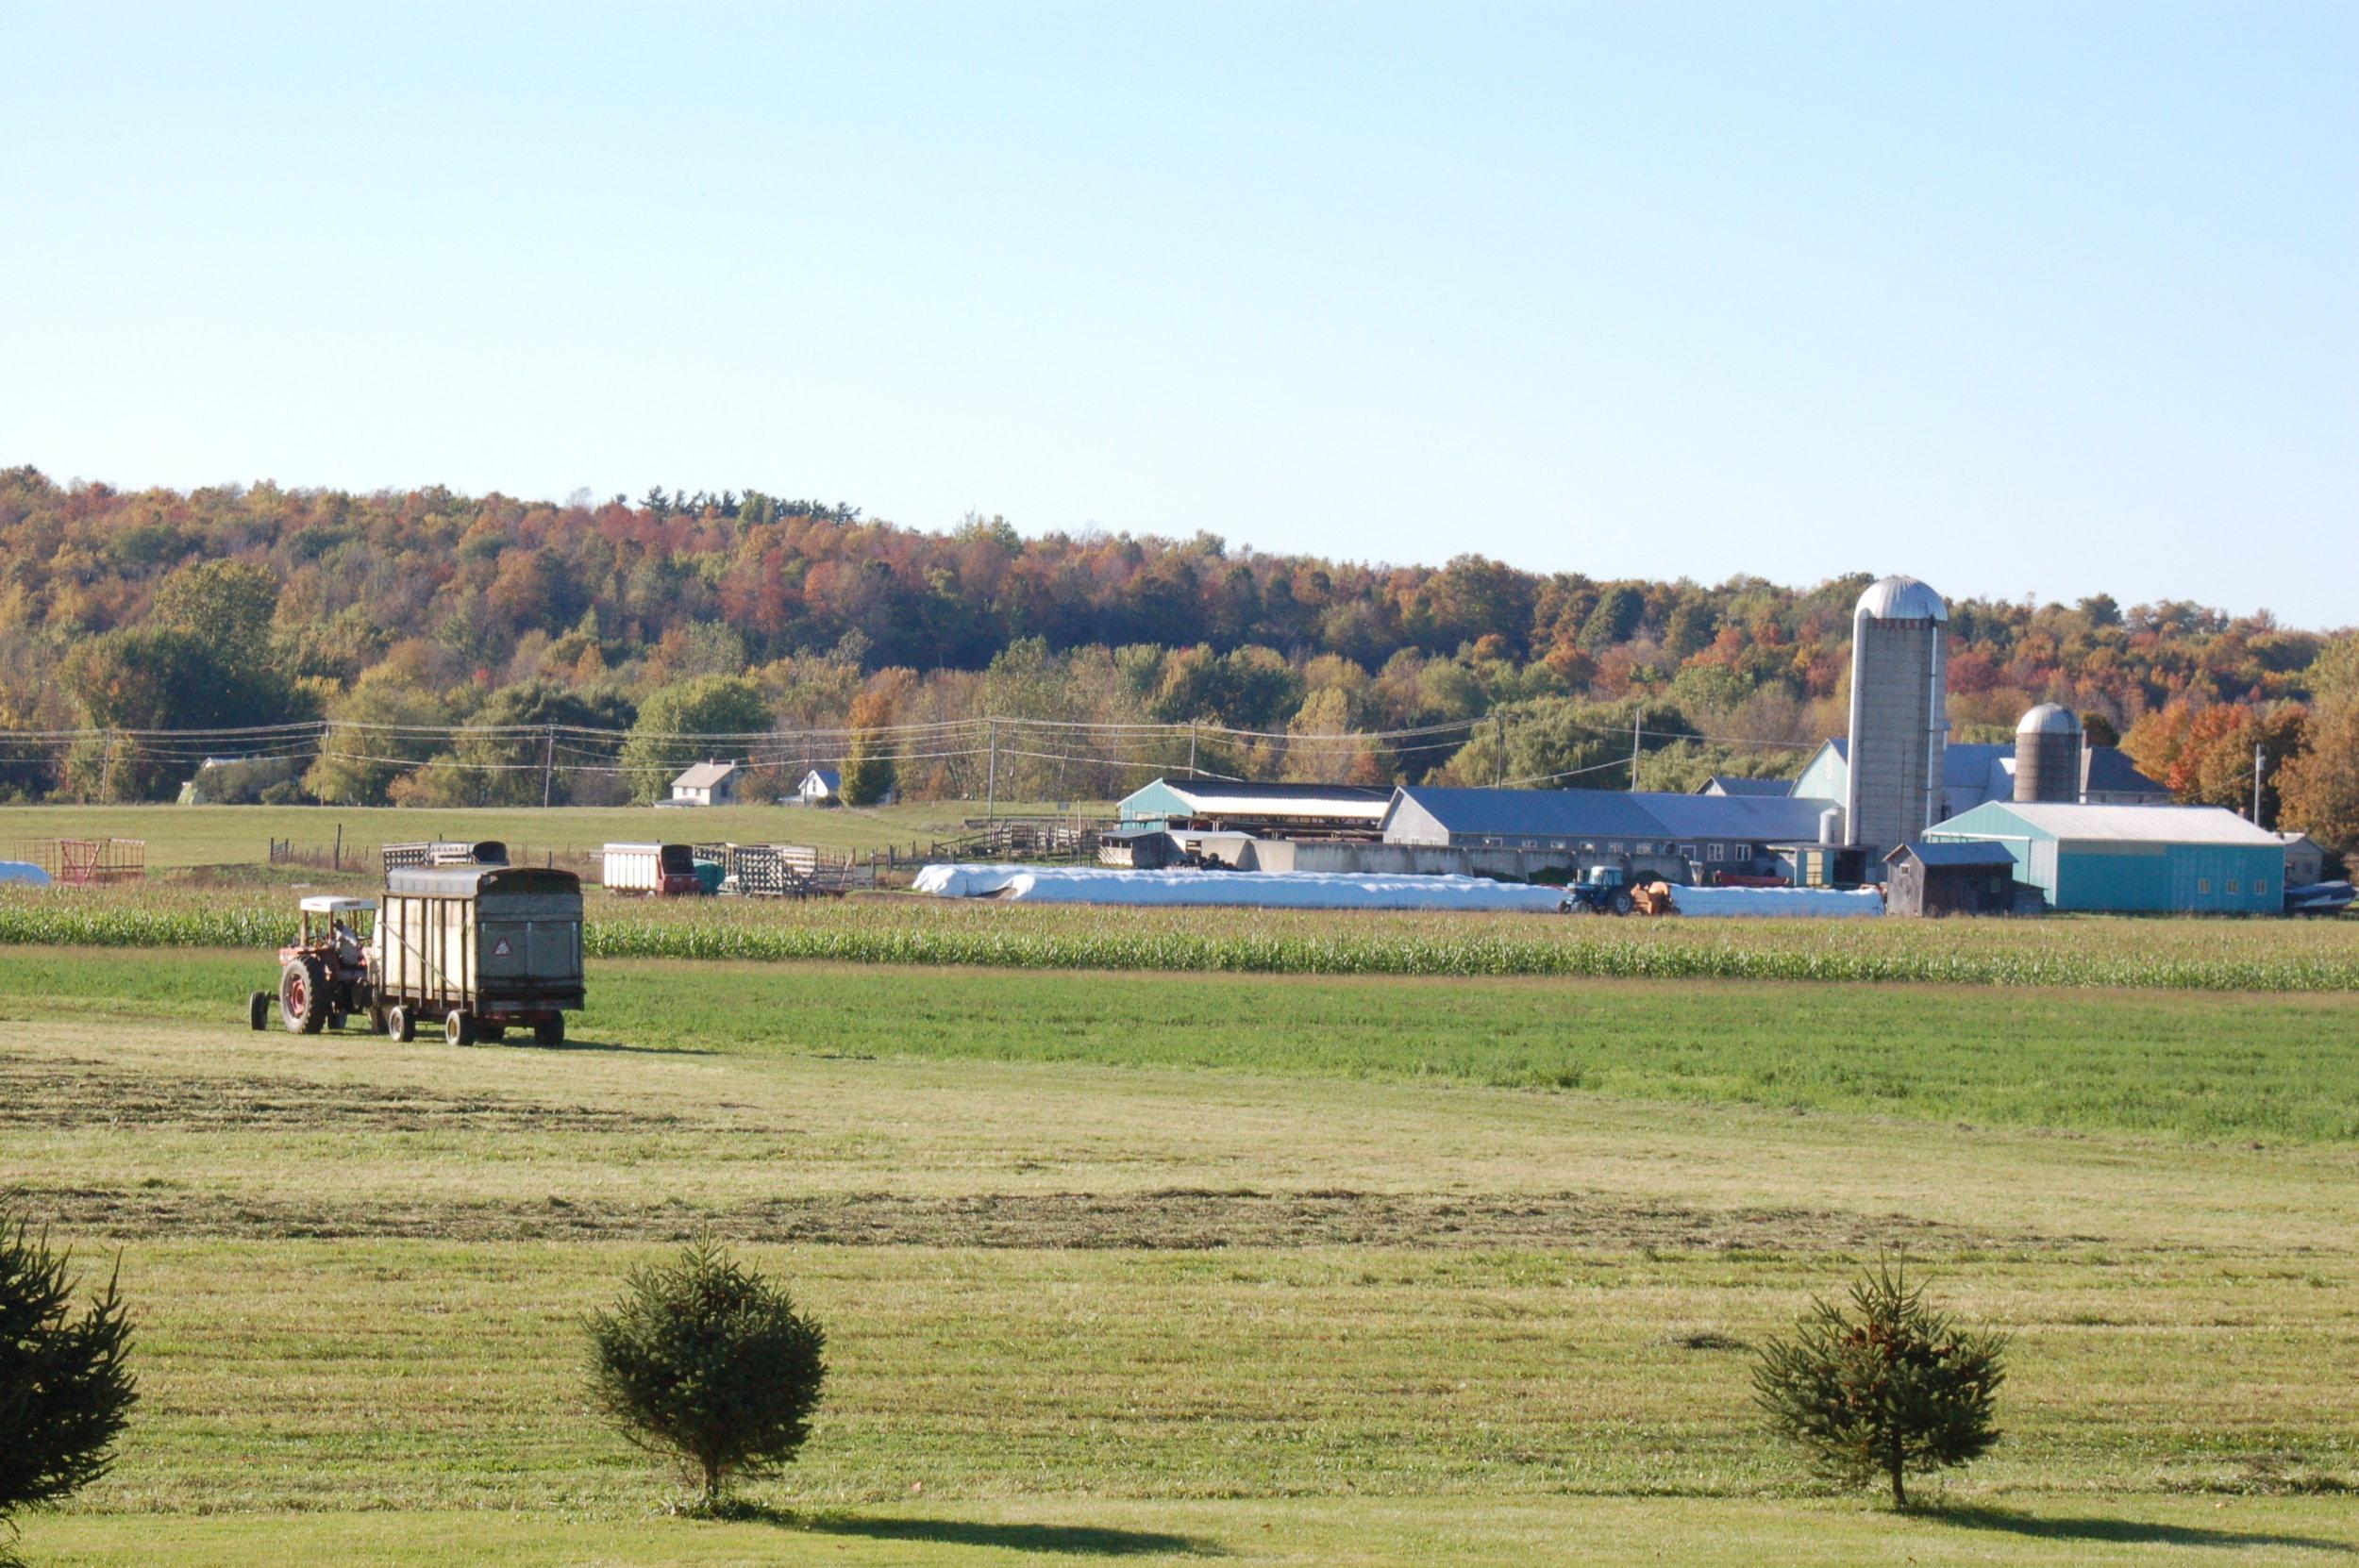 Haying at Islandacres Farm